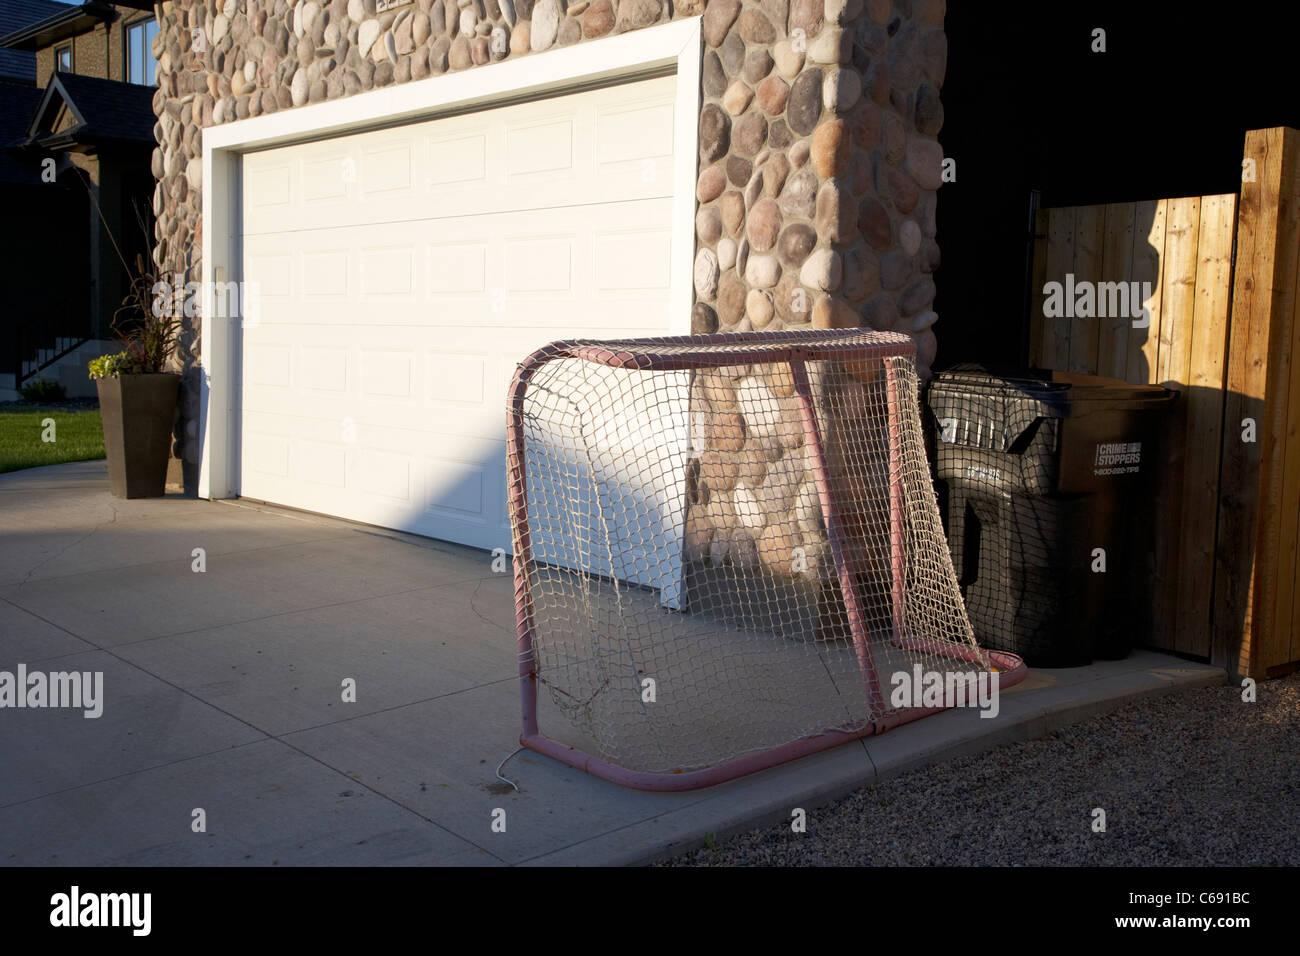 Objetivo del hockey sobre hielo en casa cochera en Saskatoon, Saskatchewan Canadá Imagen De Stock